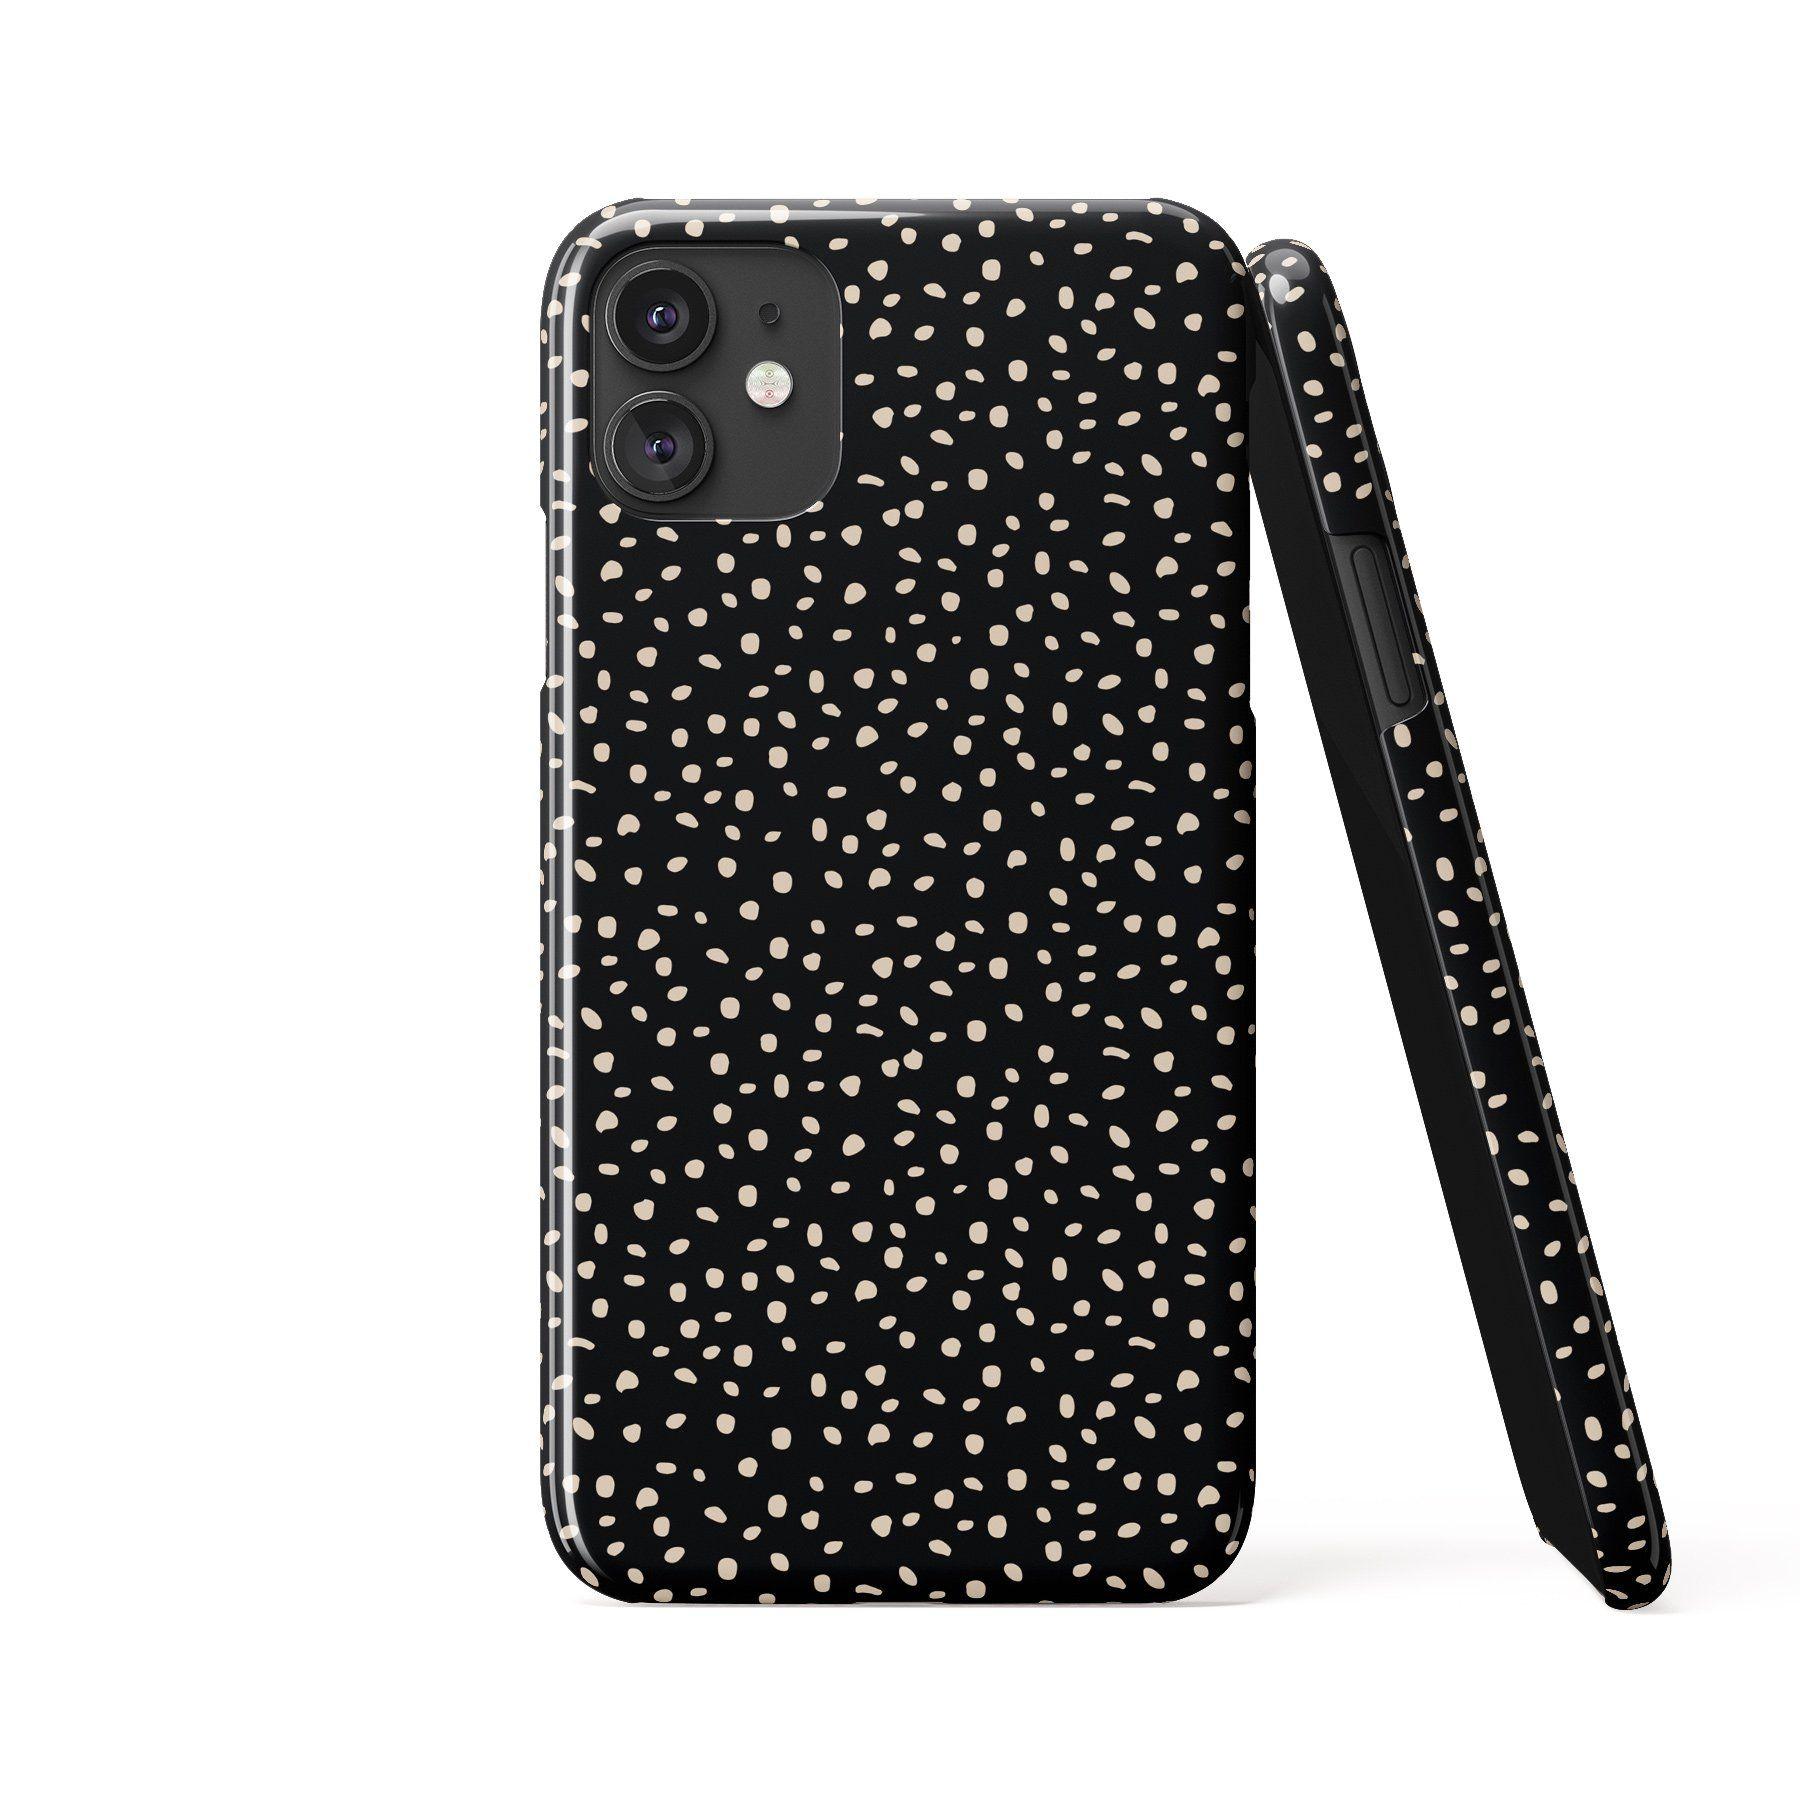 ALINA POLKA DOTS Black Phone Case - Samsung S20 Plus / Tough Case - Gloss